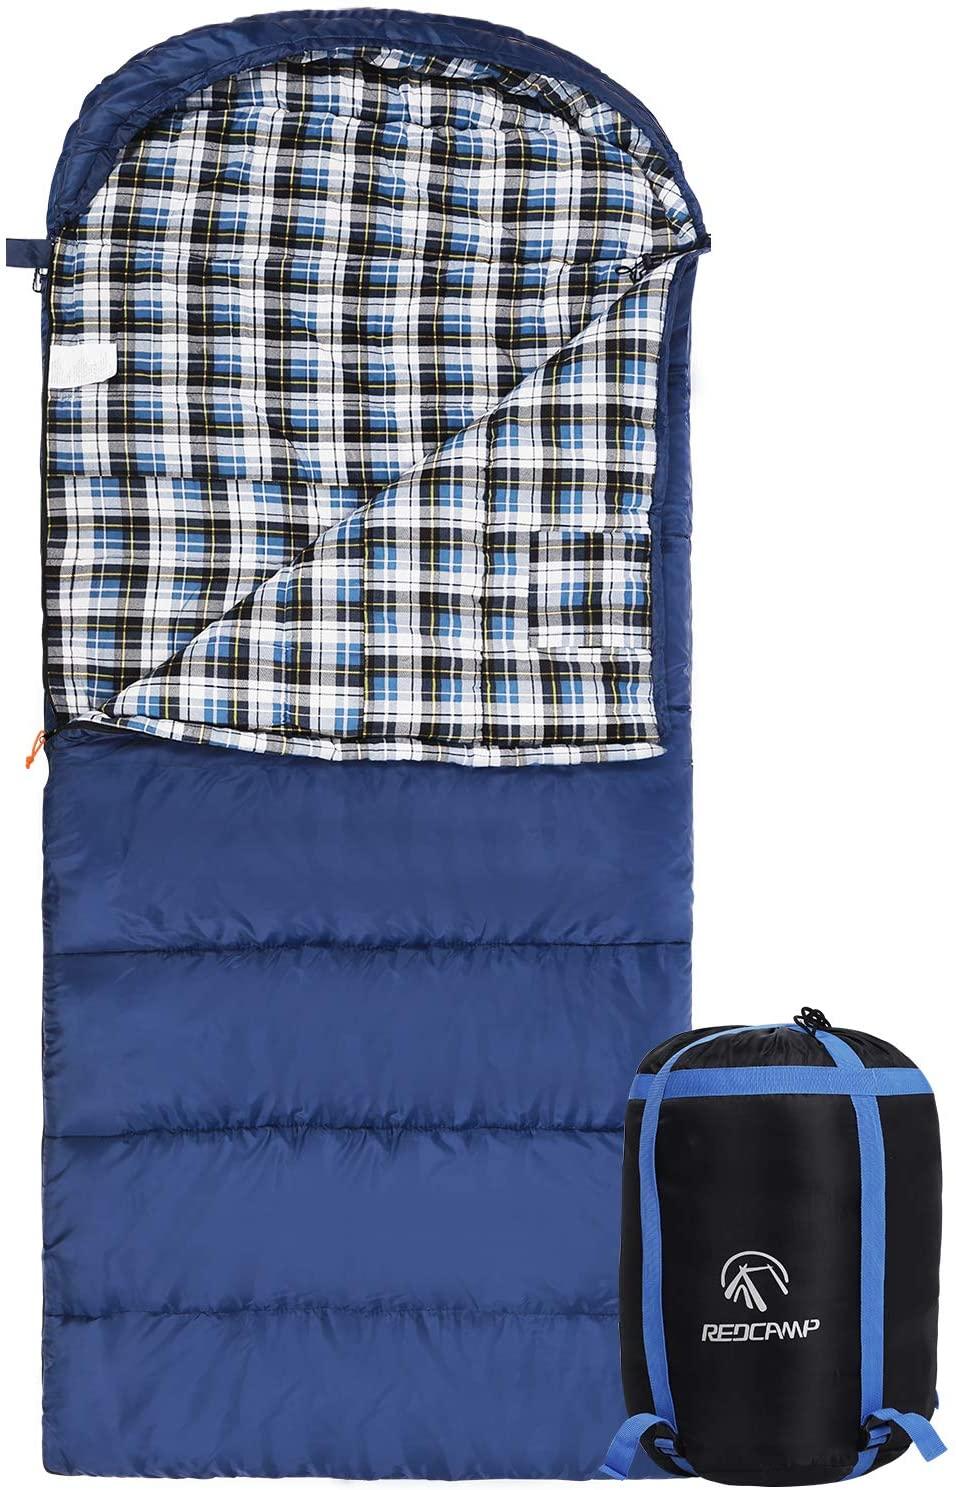 bluesleeping bag